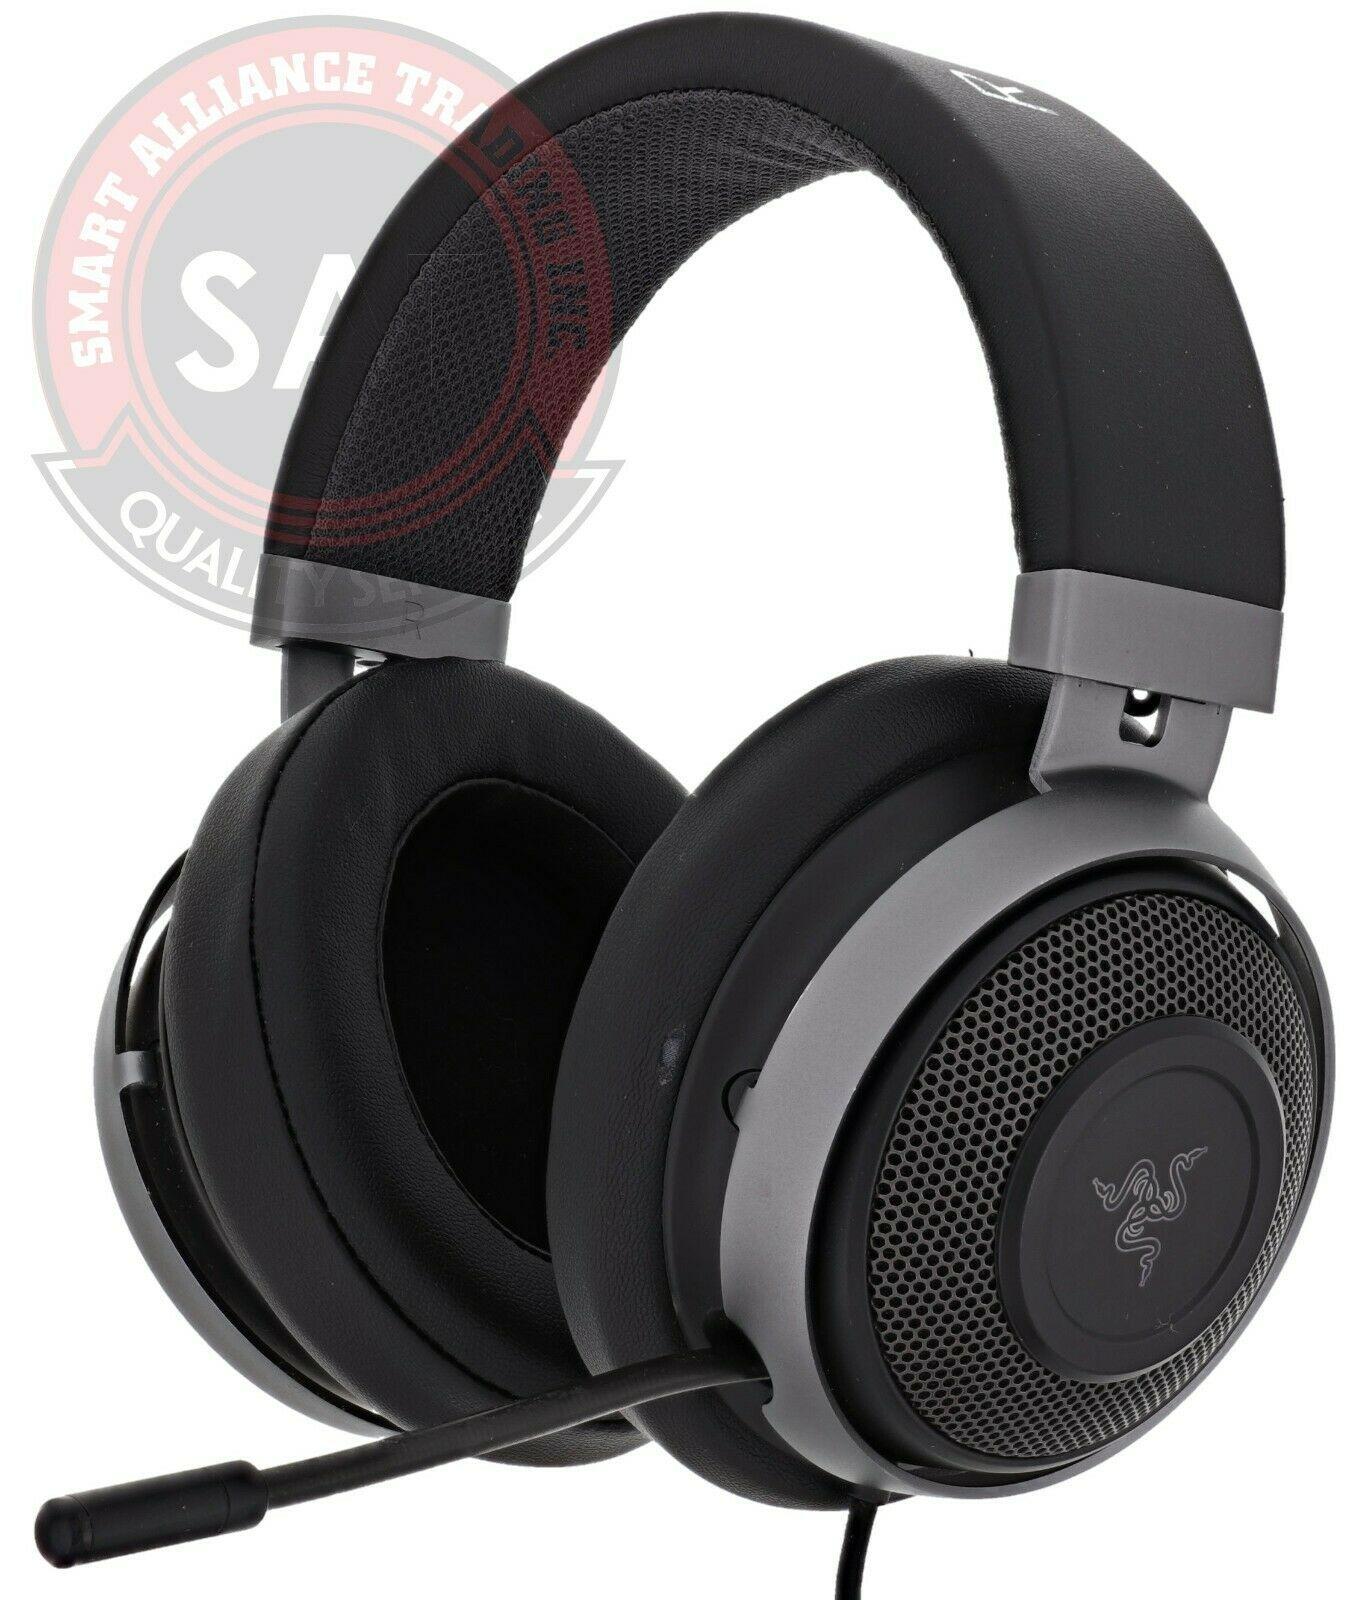 Razer Kraken 7 1 V2 Gaming Headset For Pc Ps4 Xbox One Gunmetal Grey Used Gaming Headphones Ideas Of Gaming Headphones Gaming In 2020 Headset Razer Gaming Headset